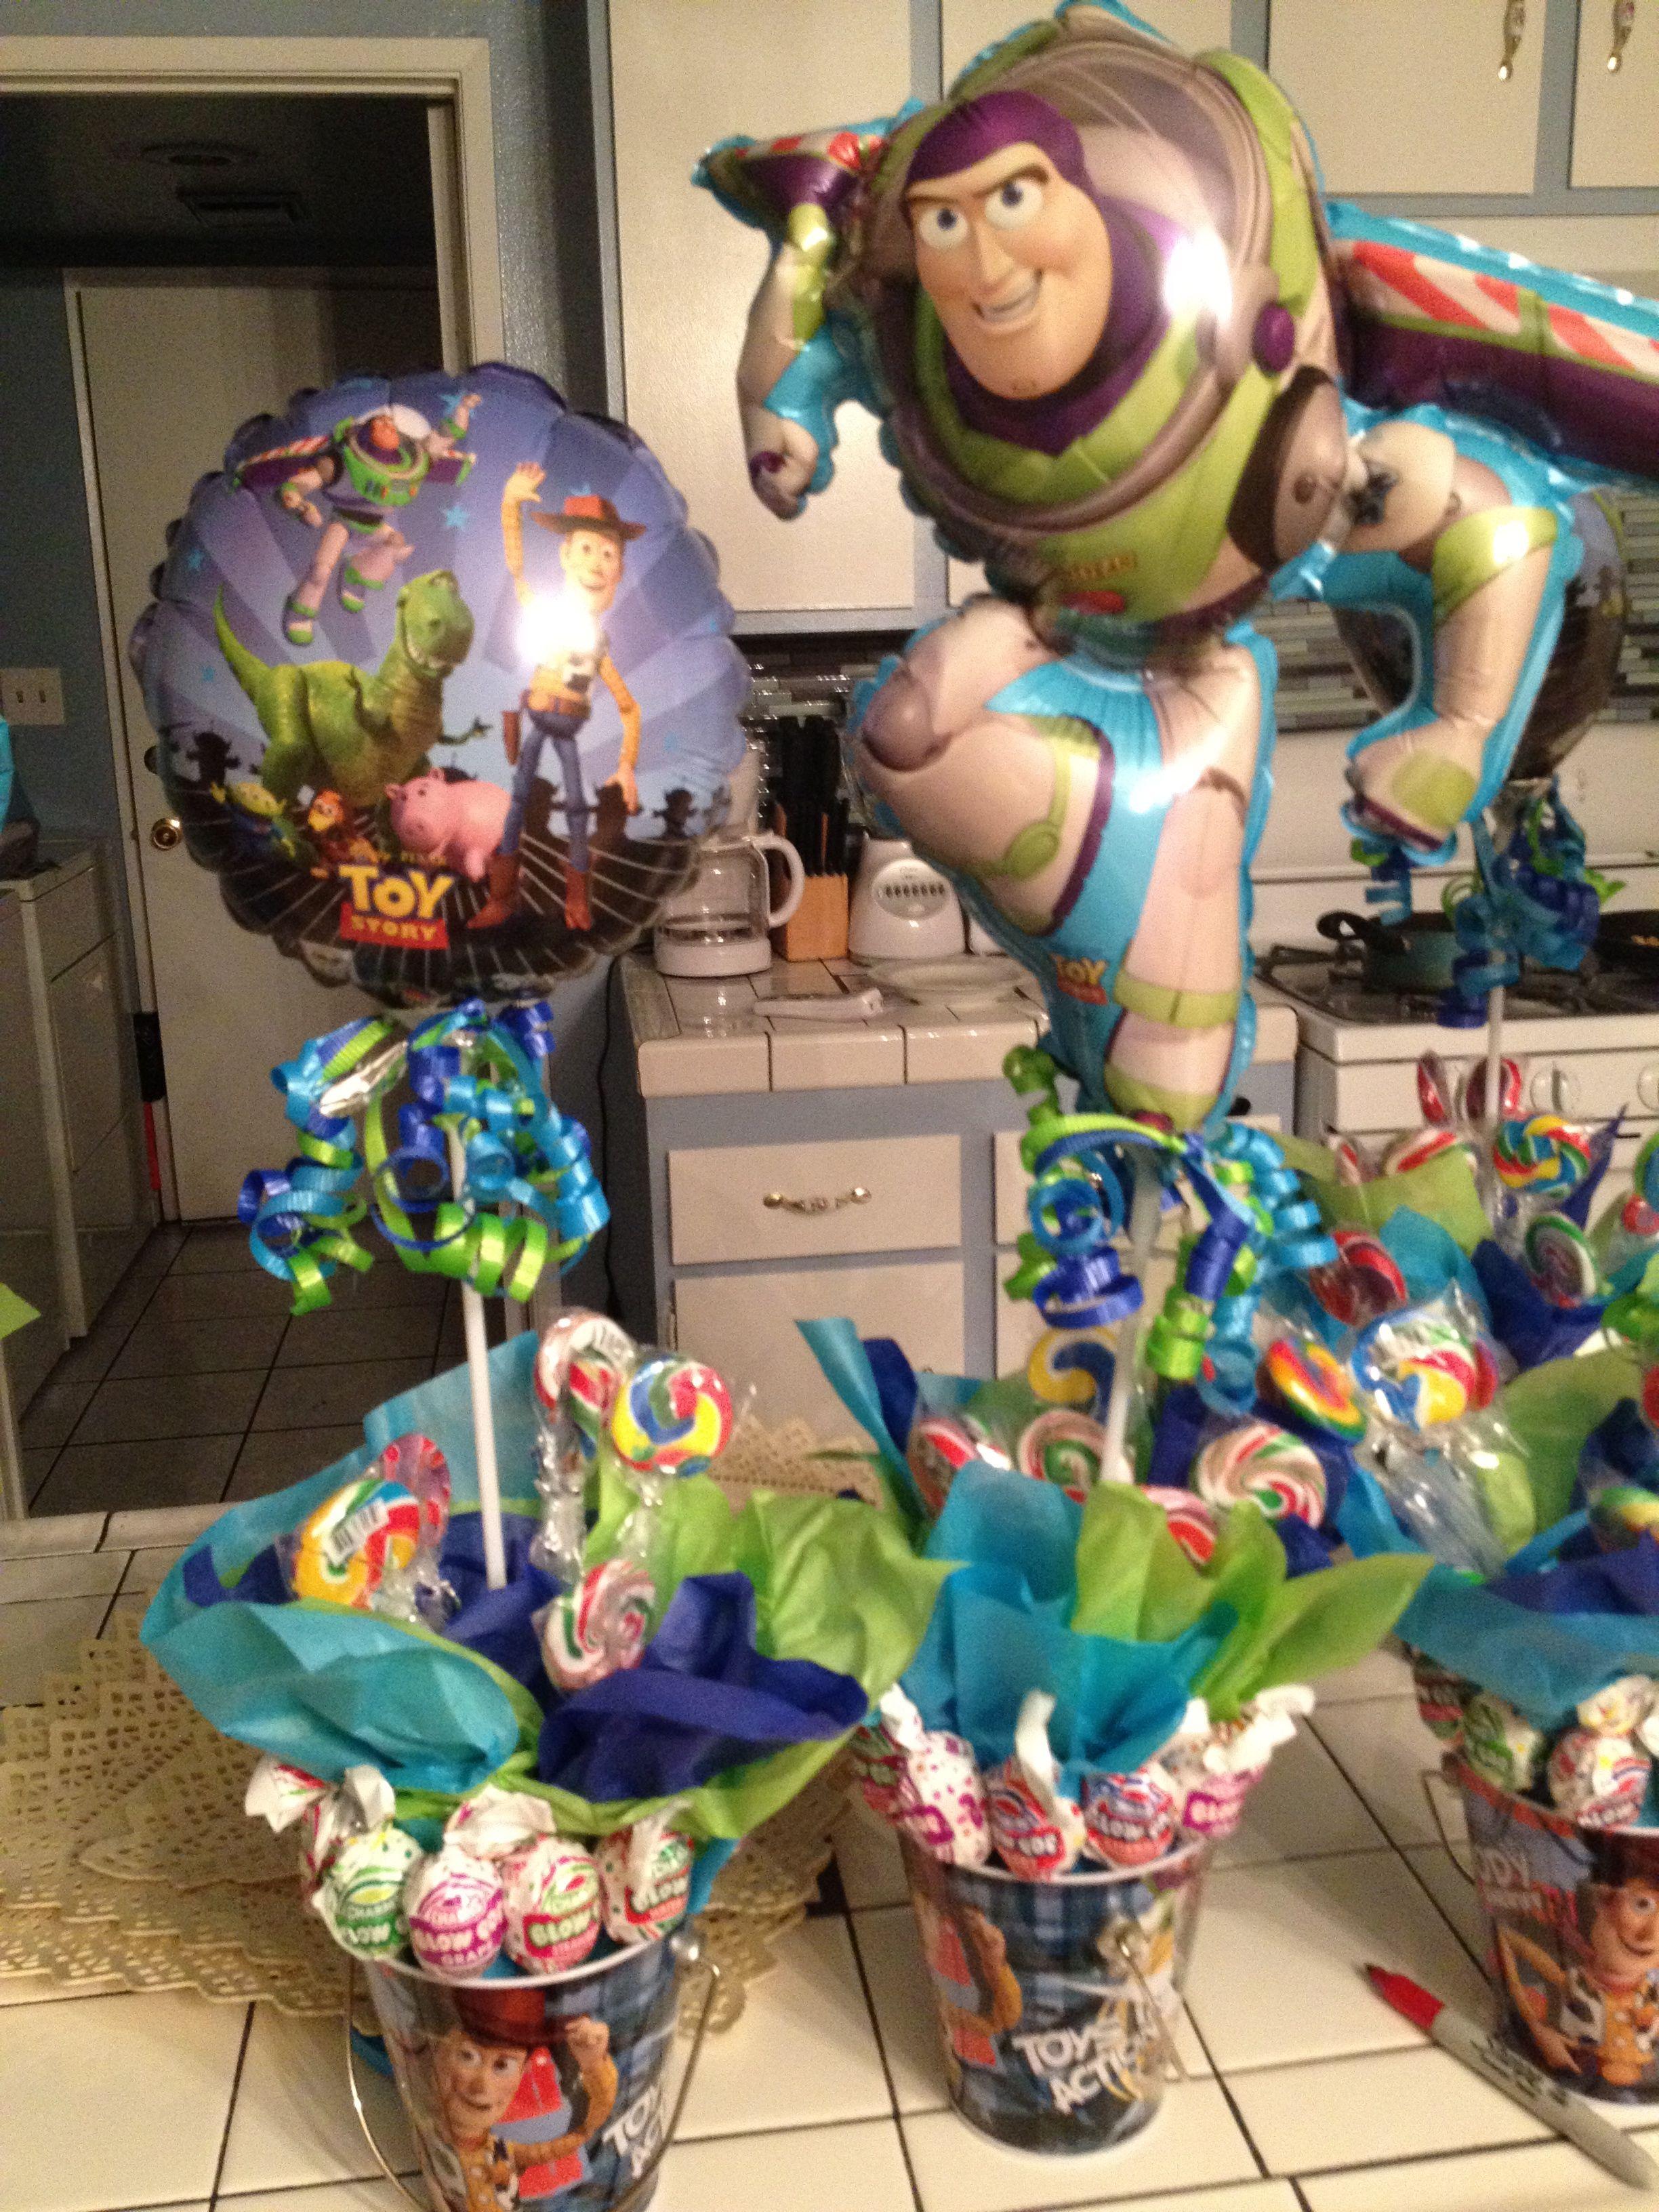 Sensational Buzz Lightyear Centerpieces For My Nephews Birthday Party Download Free Architecture Designs Scobabritishbridgeorg